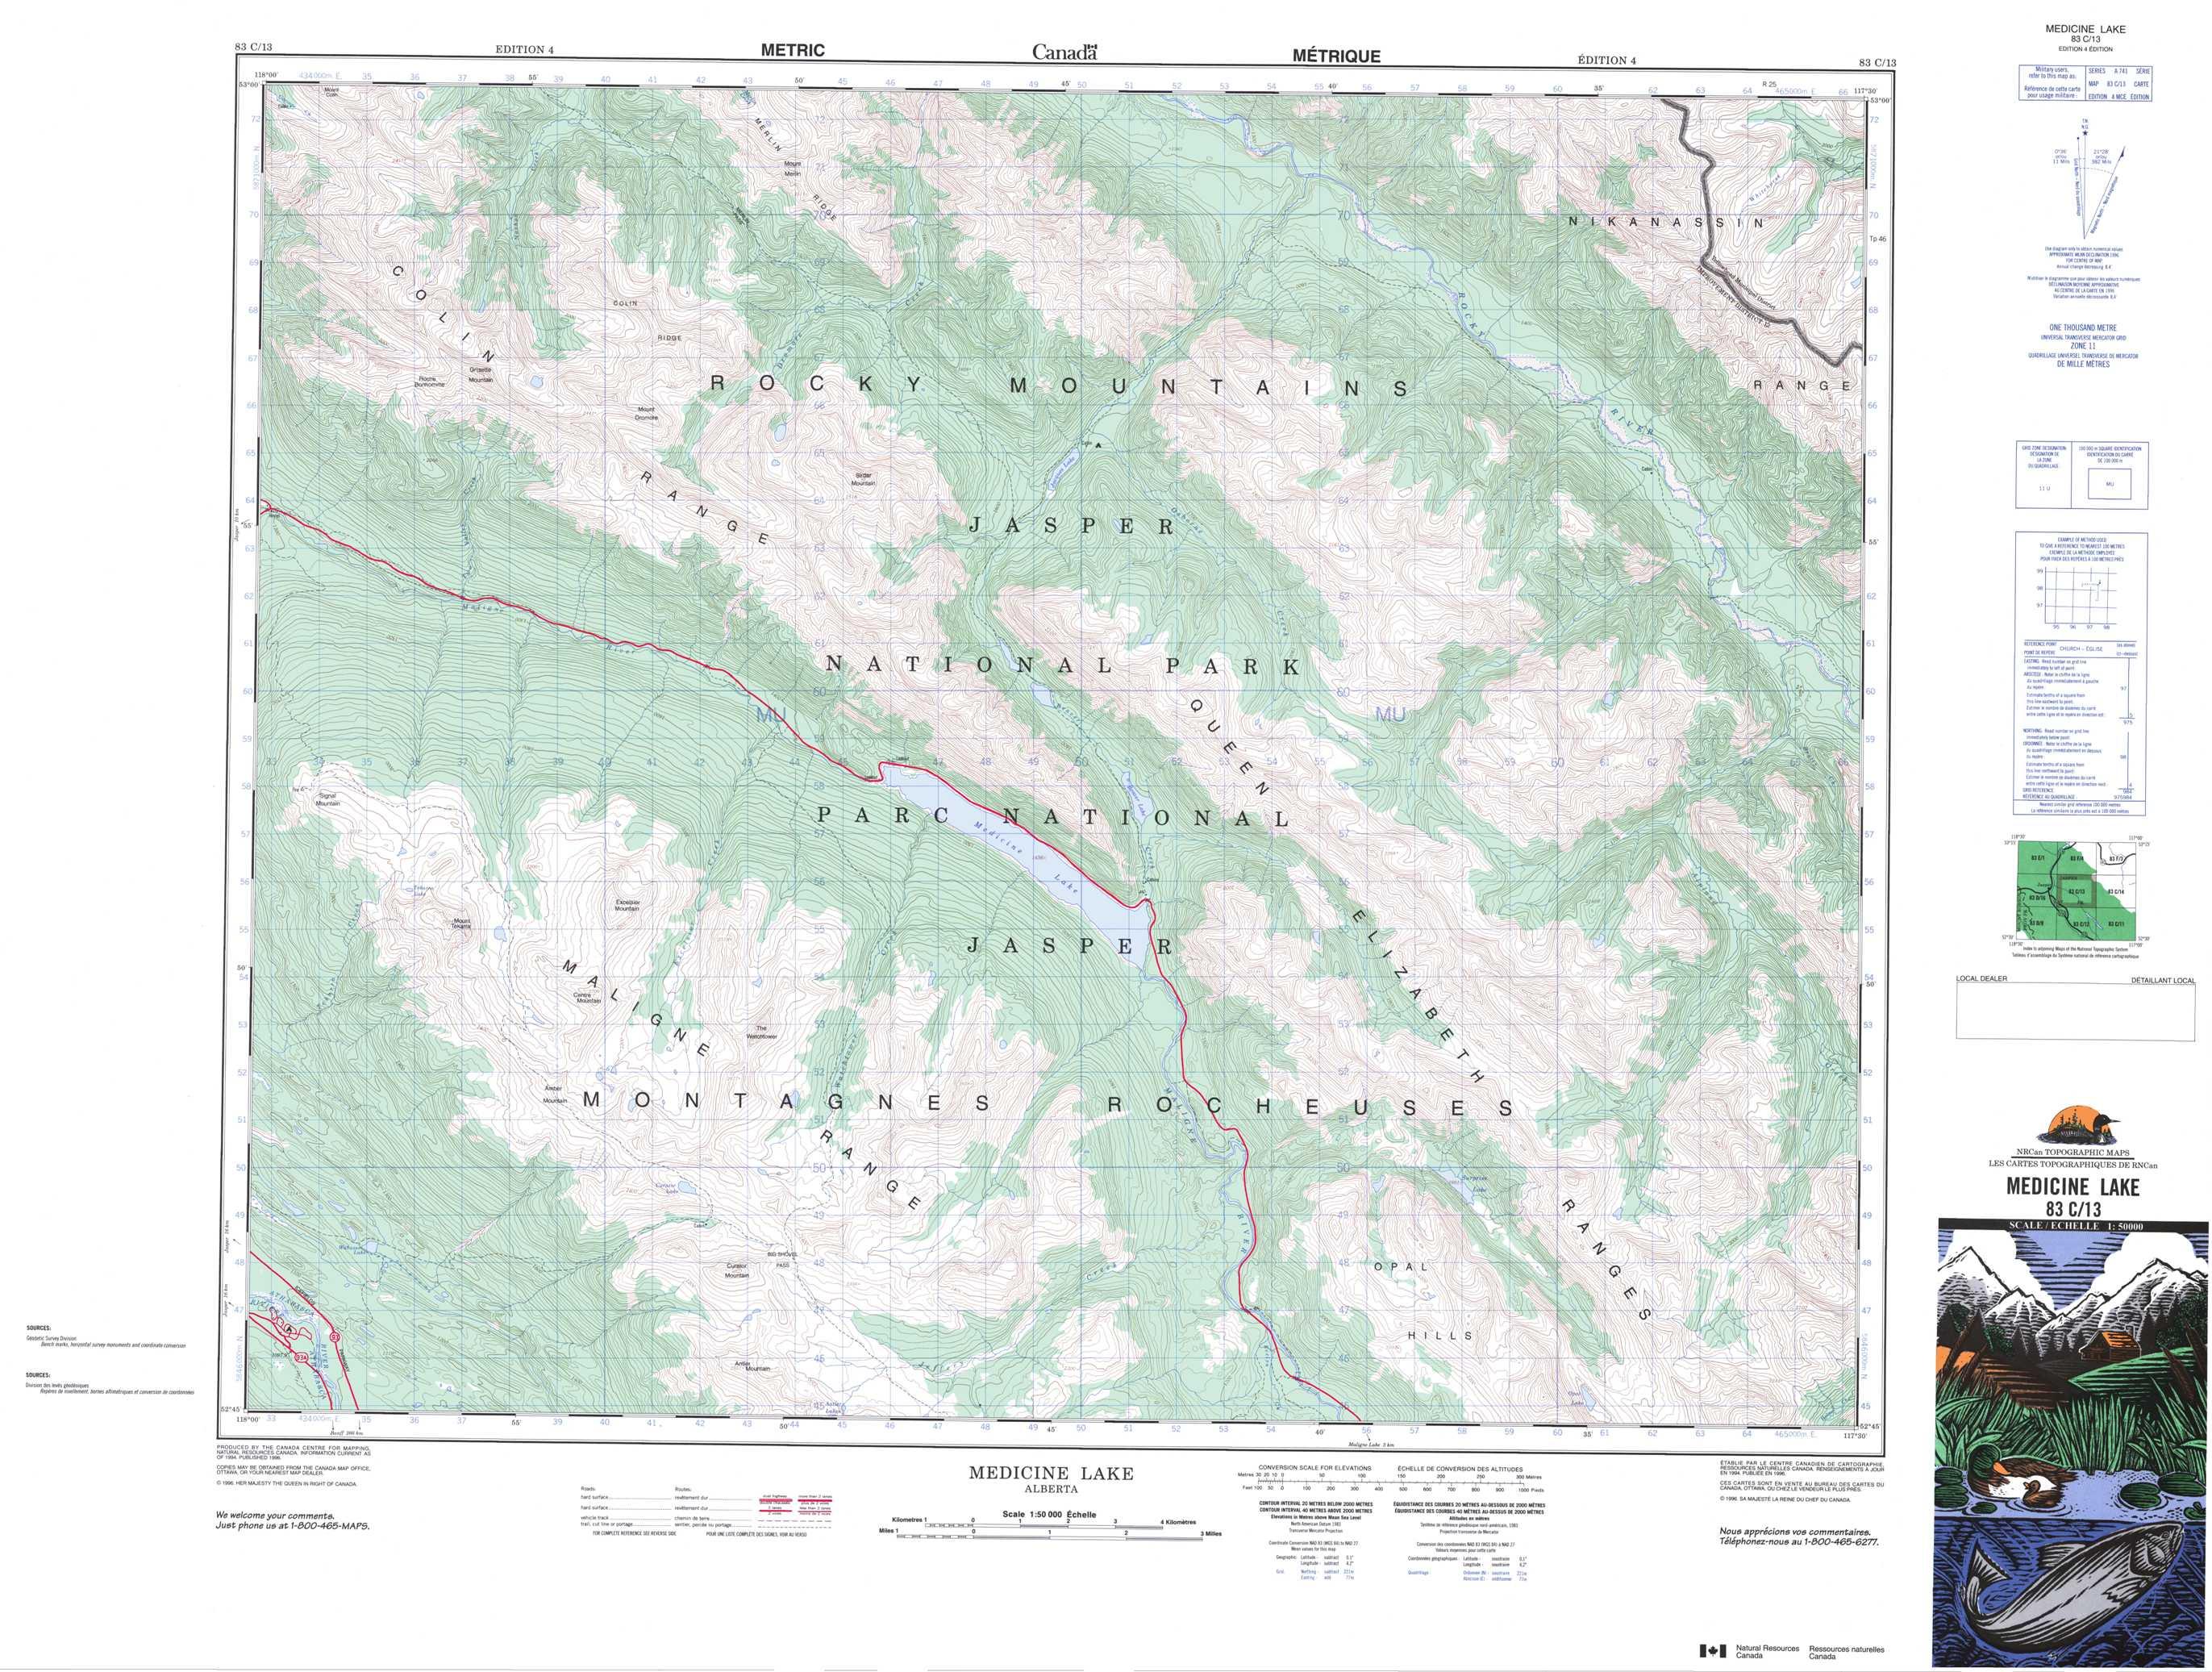 Medicine Lake Canada Map Buy Medicine Lake Topographic Map: NTS Sheet 083C13 at 1:50,000 Scale